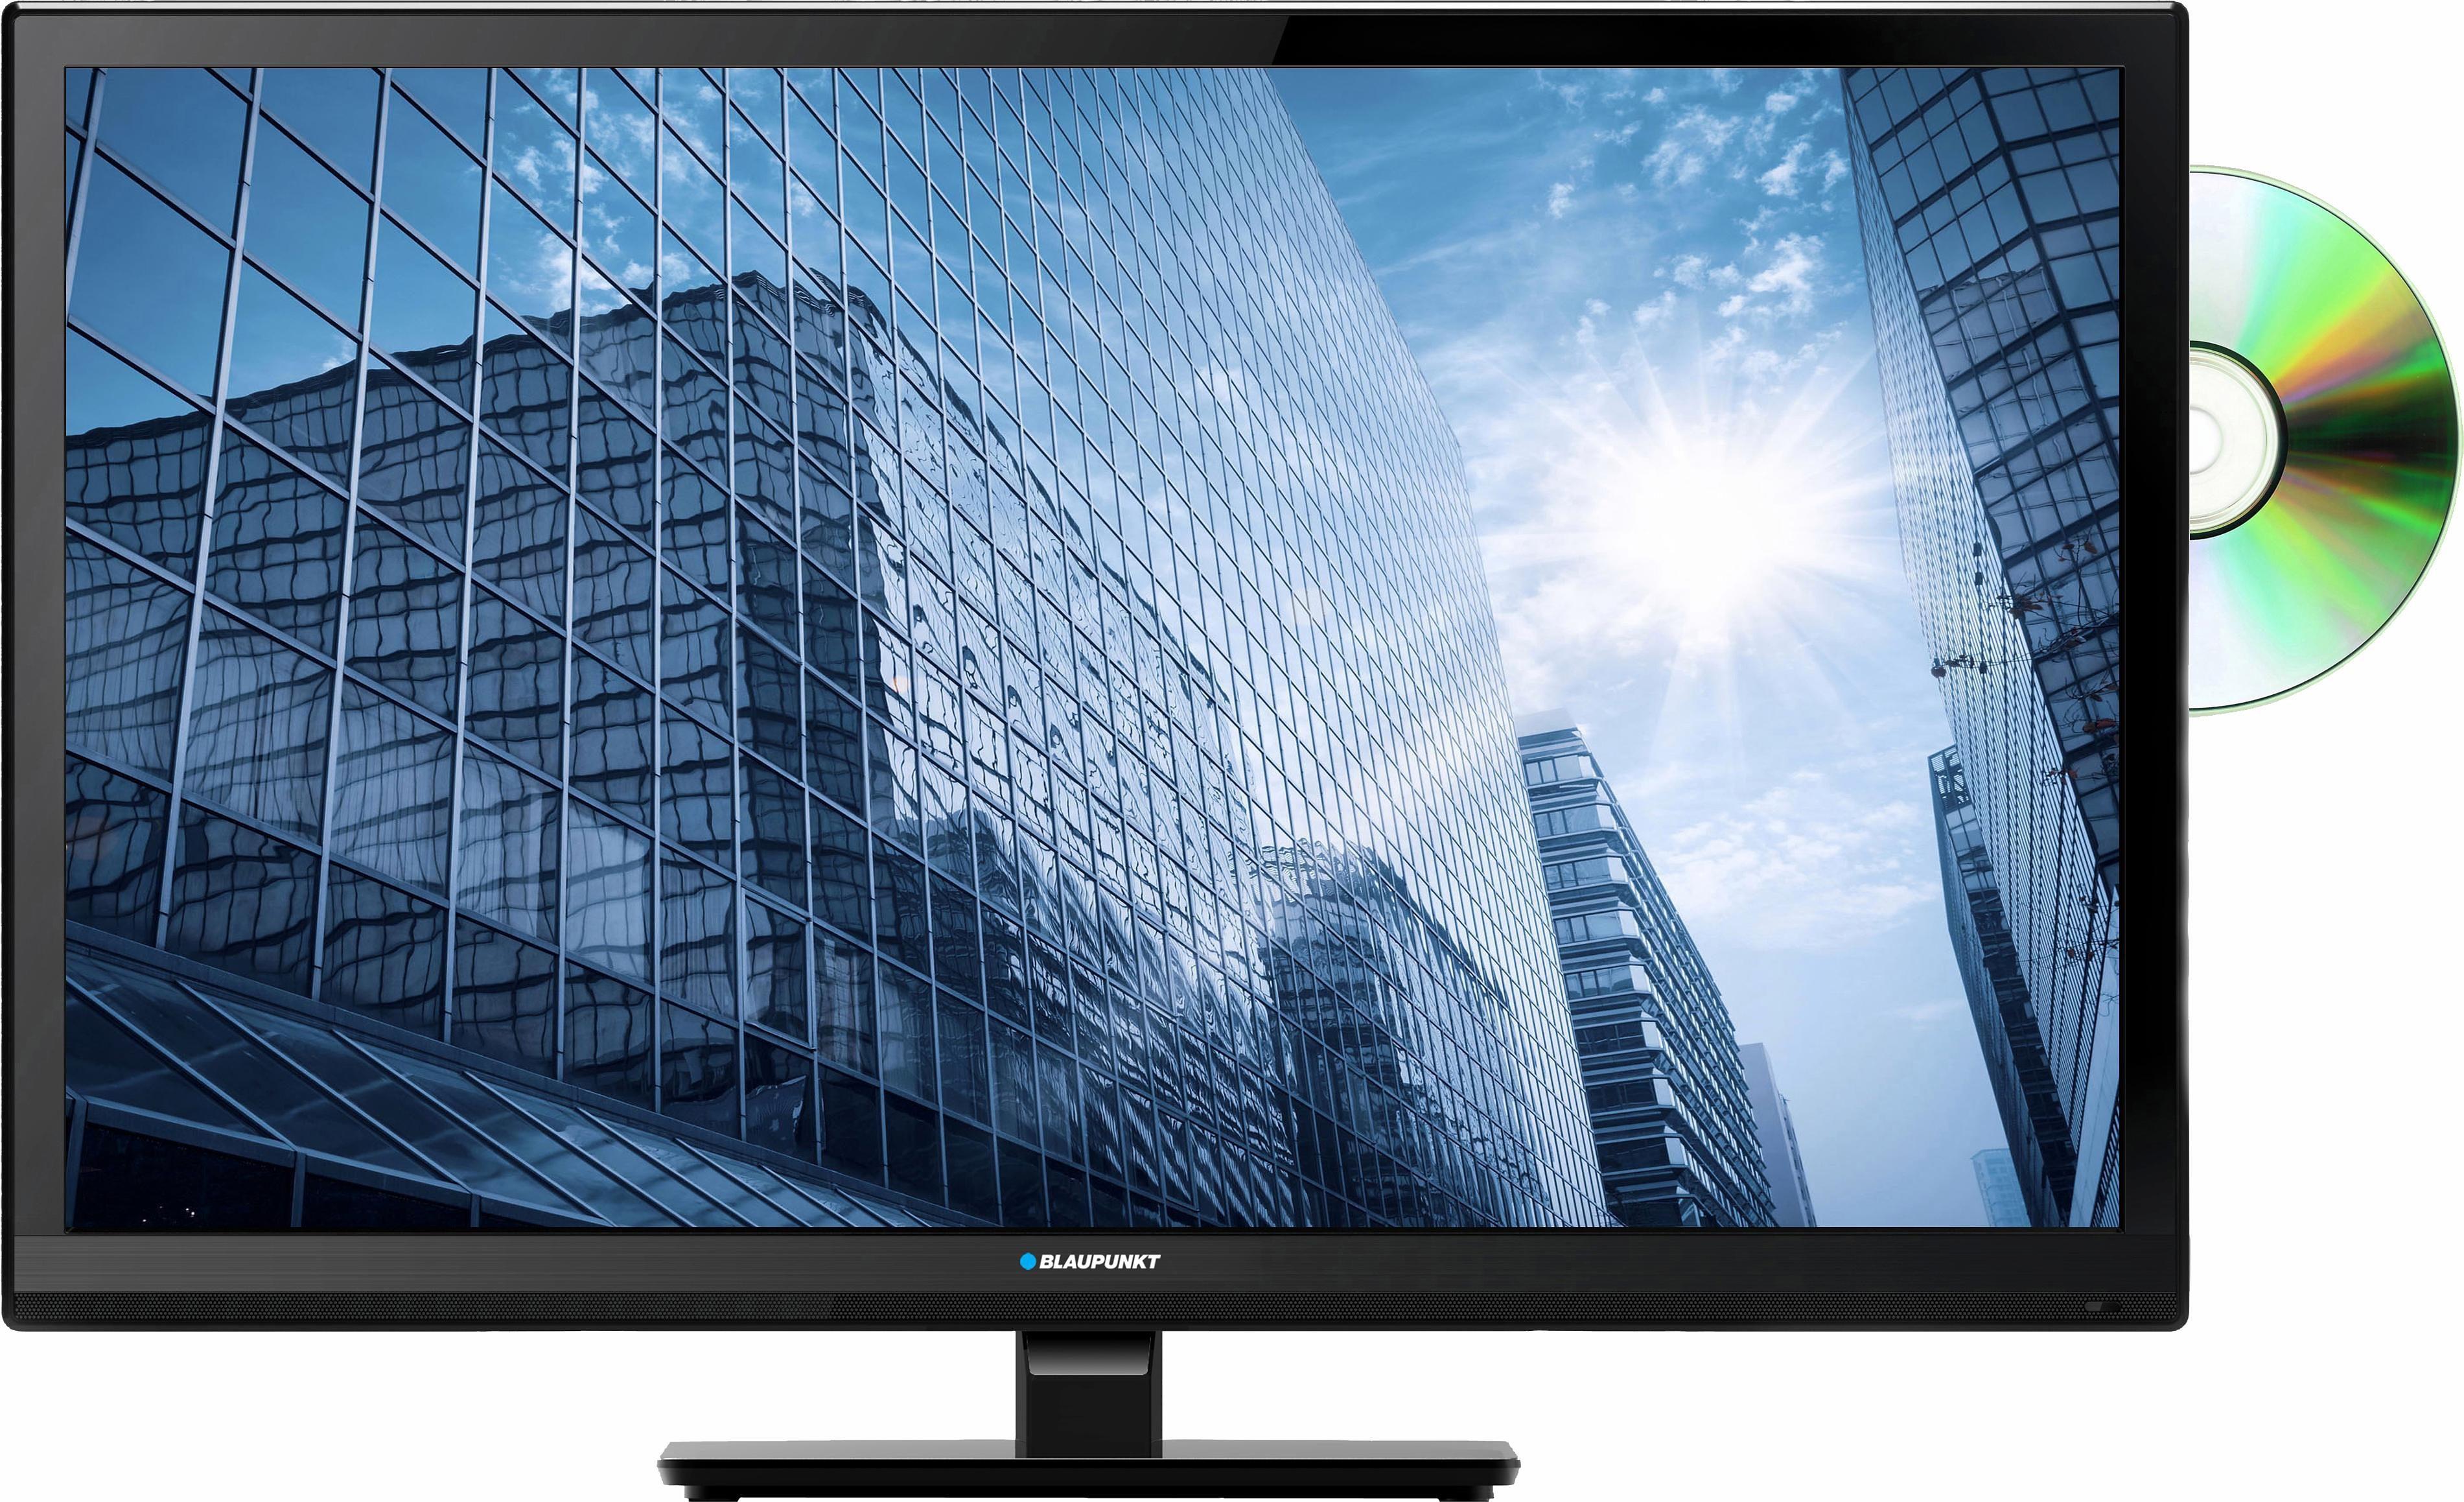 Blaupunkt B23O207T2CS2HDD, LED Fernseher, 58 cm (23 Zoll), HD-ready 720p